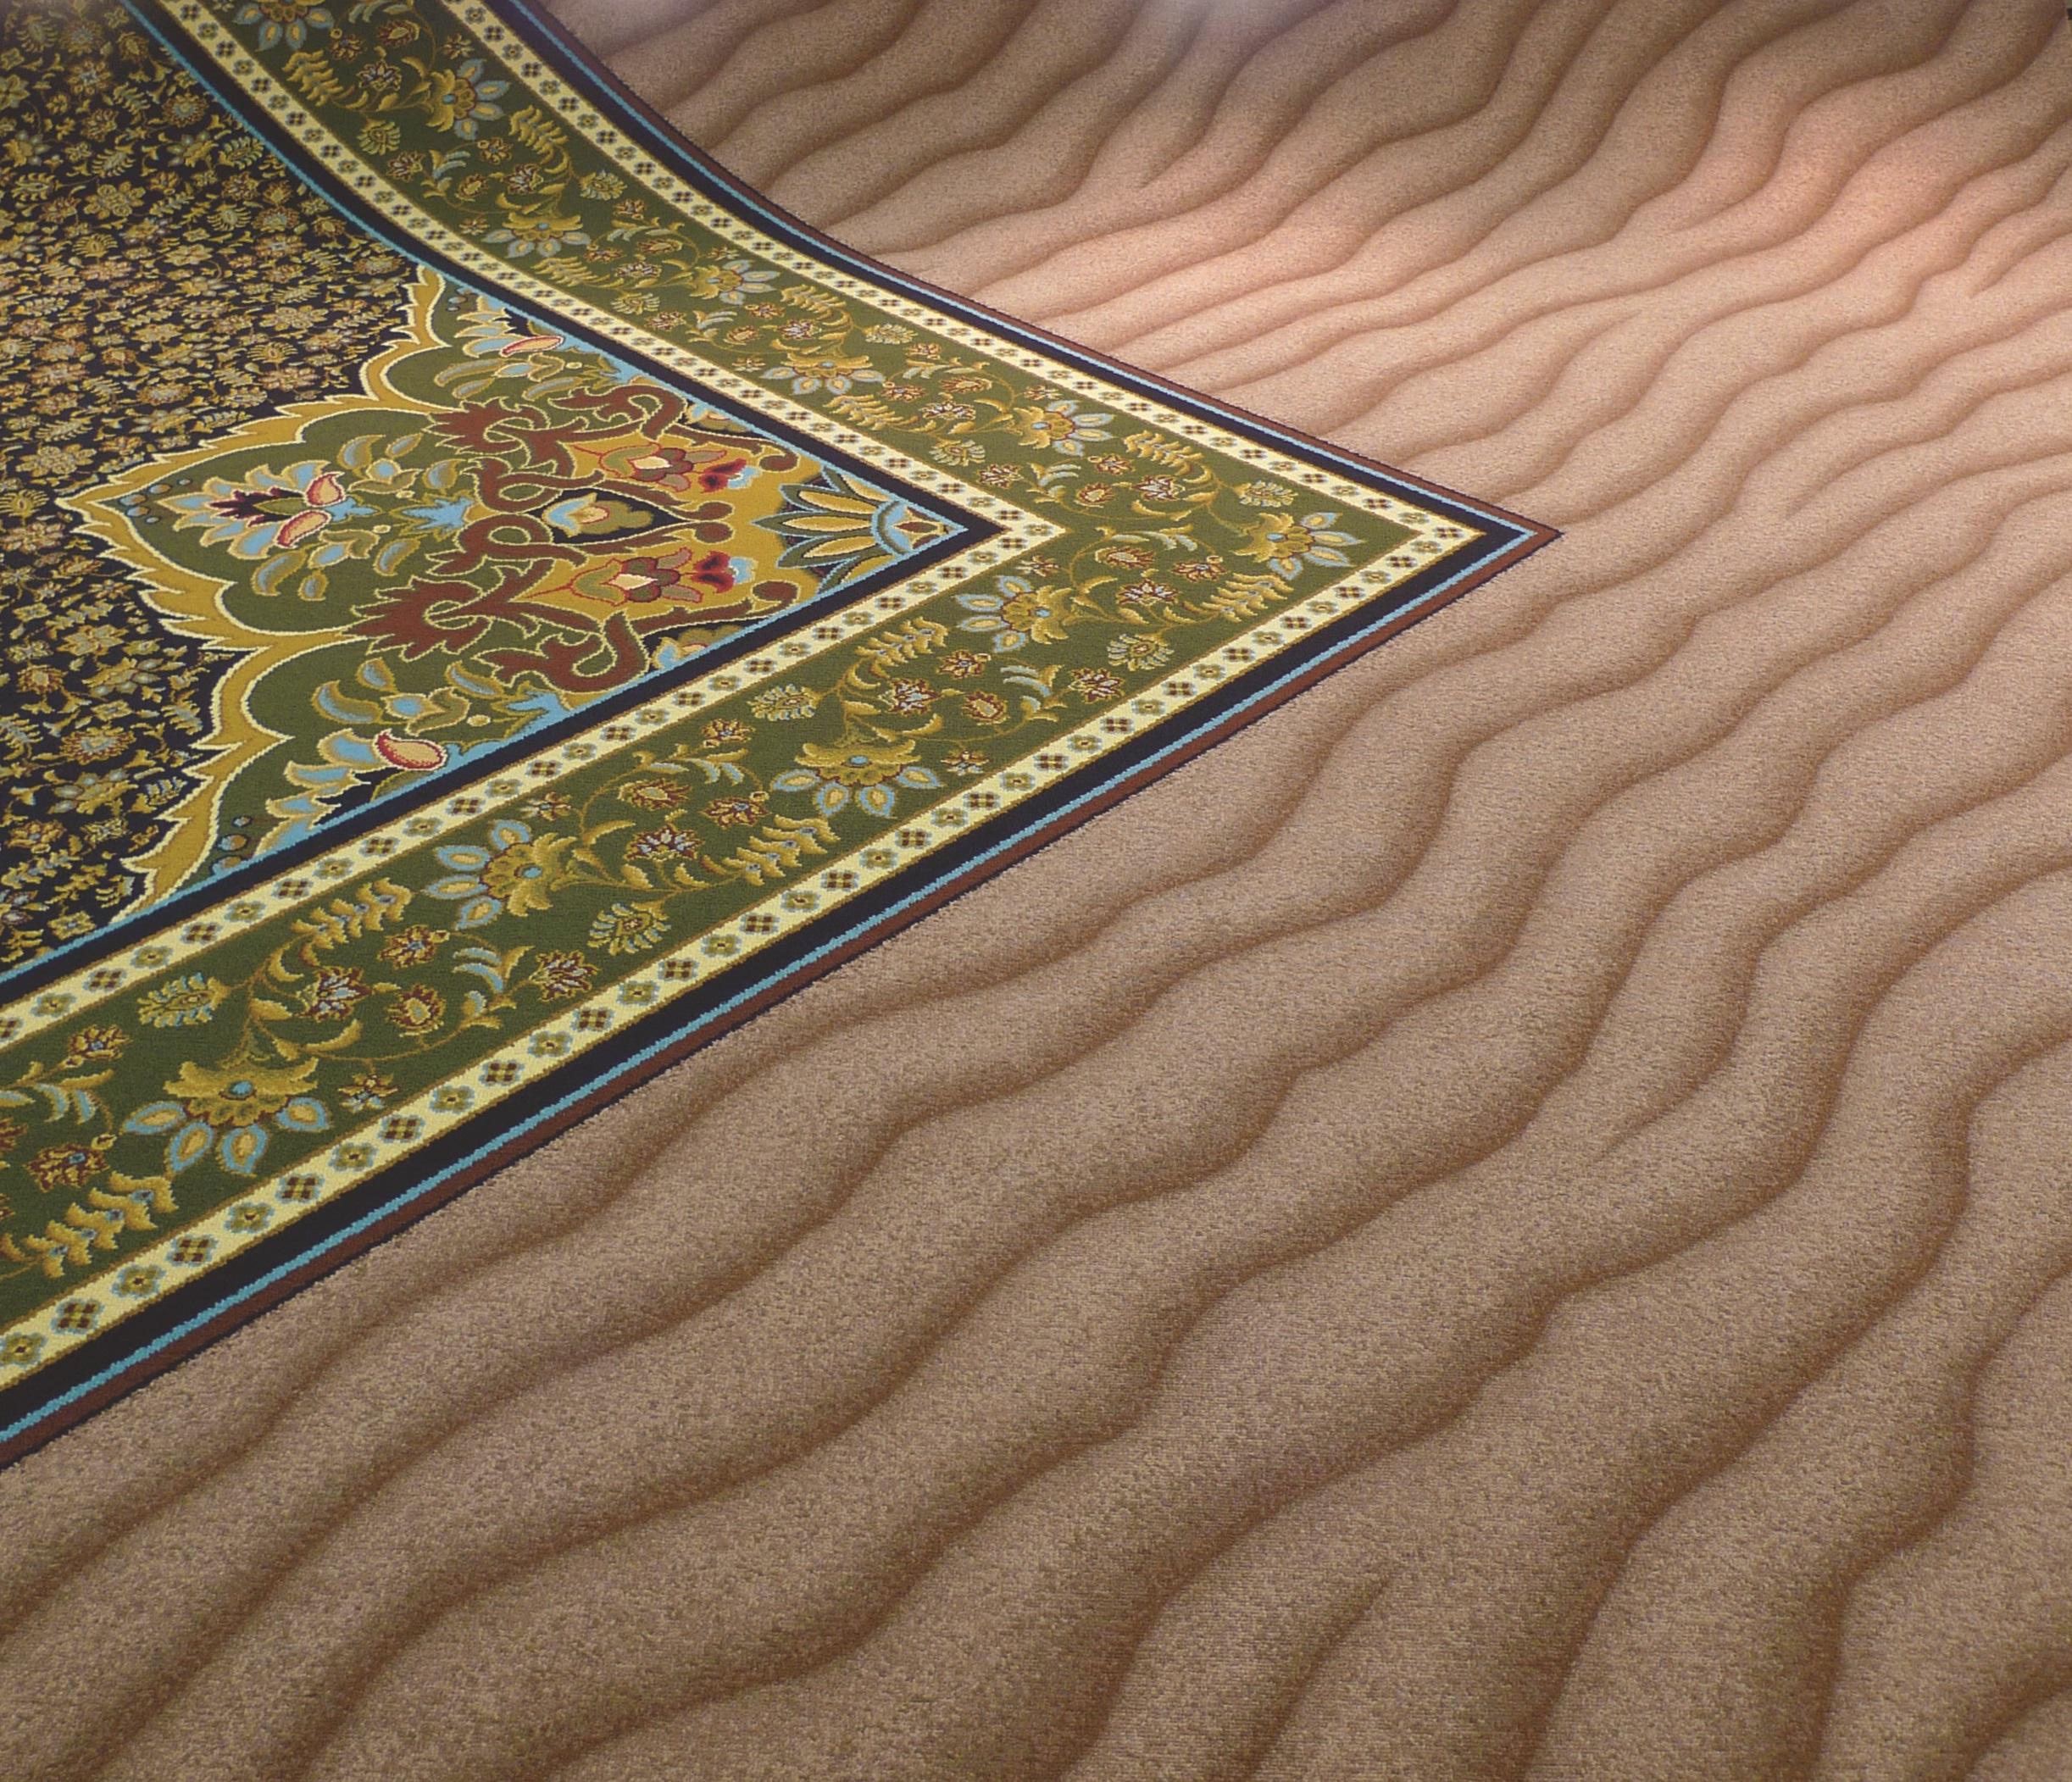 Ulster Carpet S Carpet Vidalondon